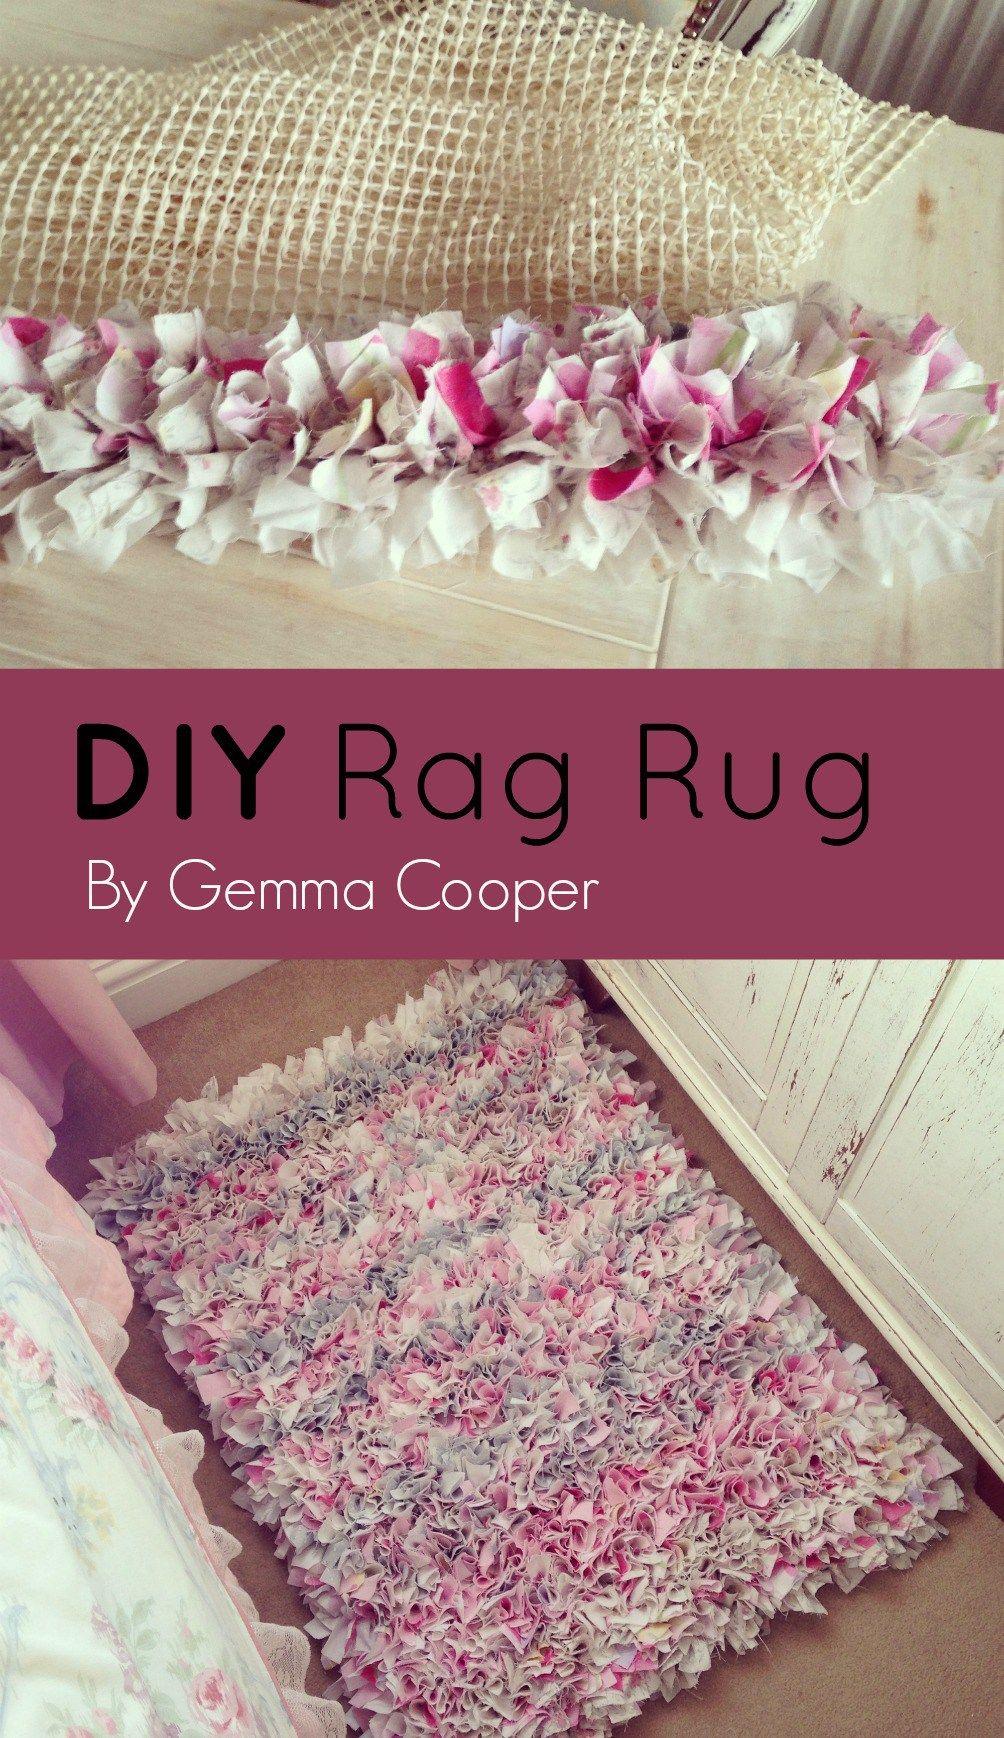 How To Make A Diy Rag Rug Using Old Bedding Diy Rug Rag Rug Rag Rug Tutorial